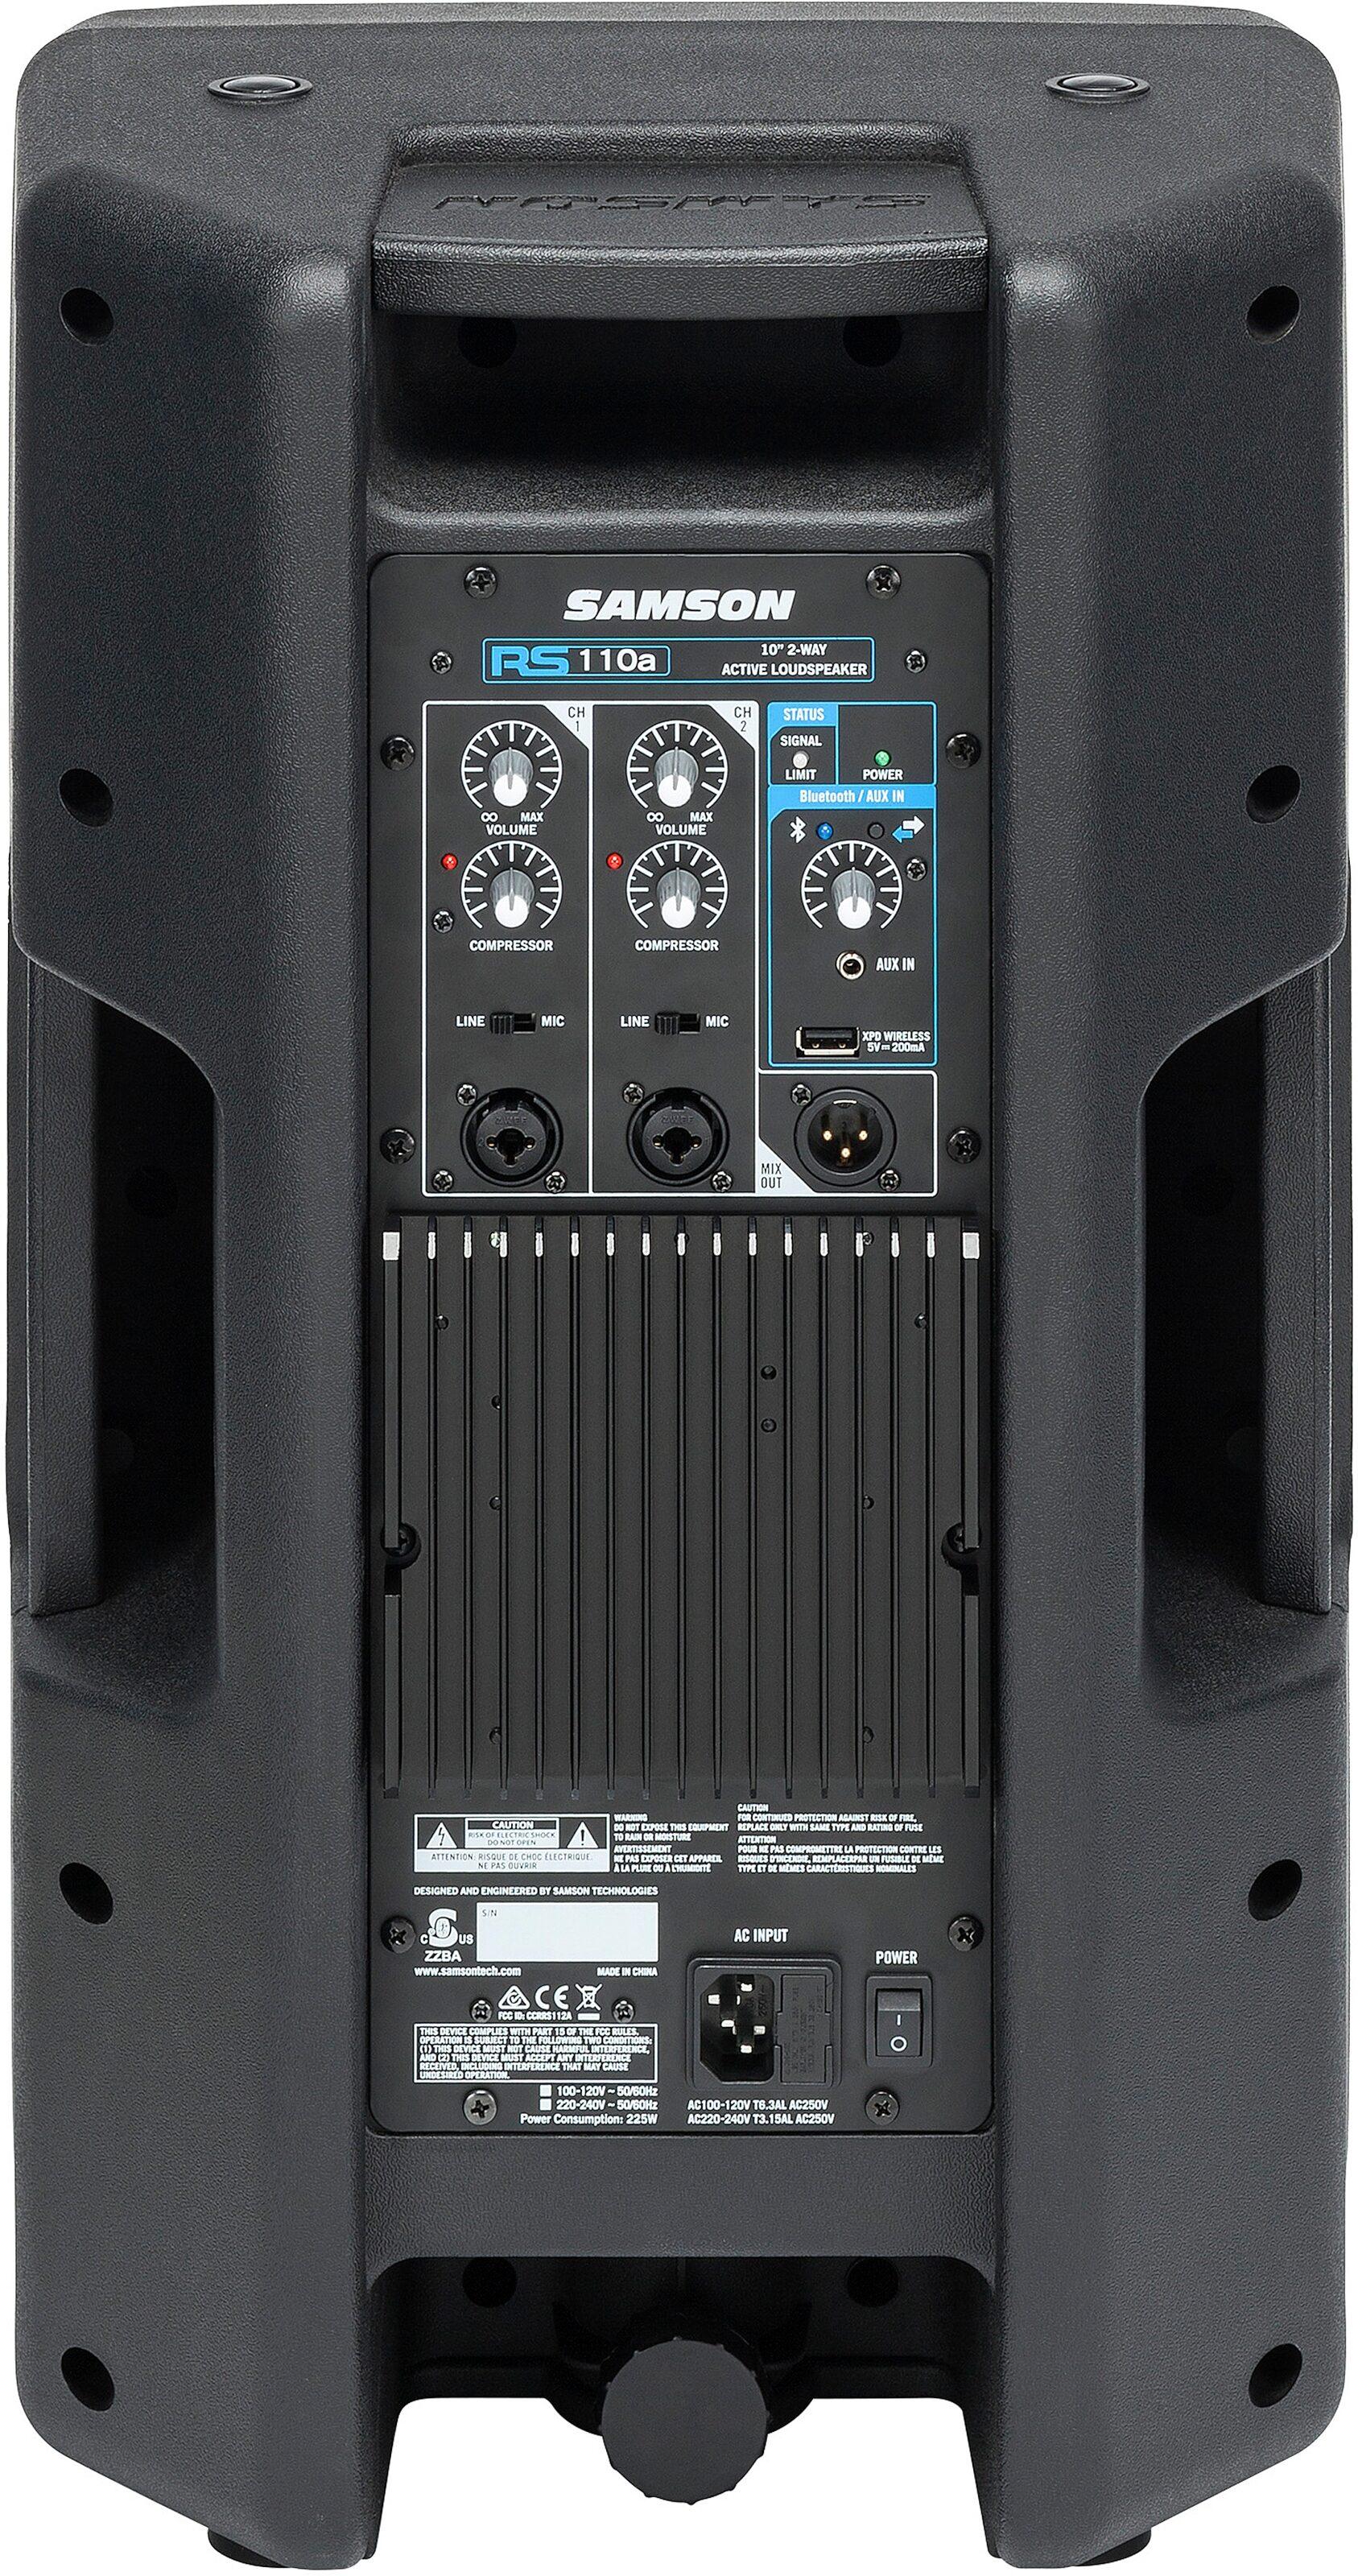 Samson RS110a - Cassa attiva 300w. due vie. 10